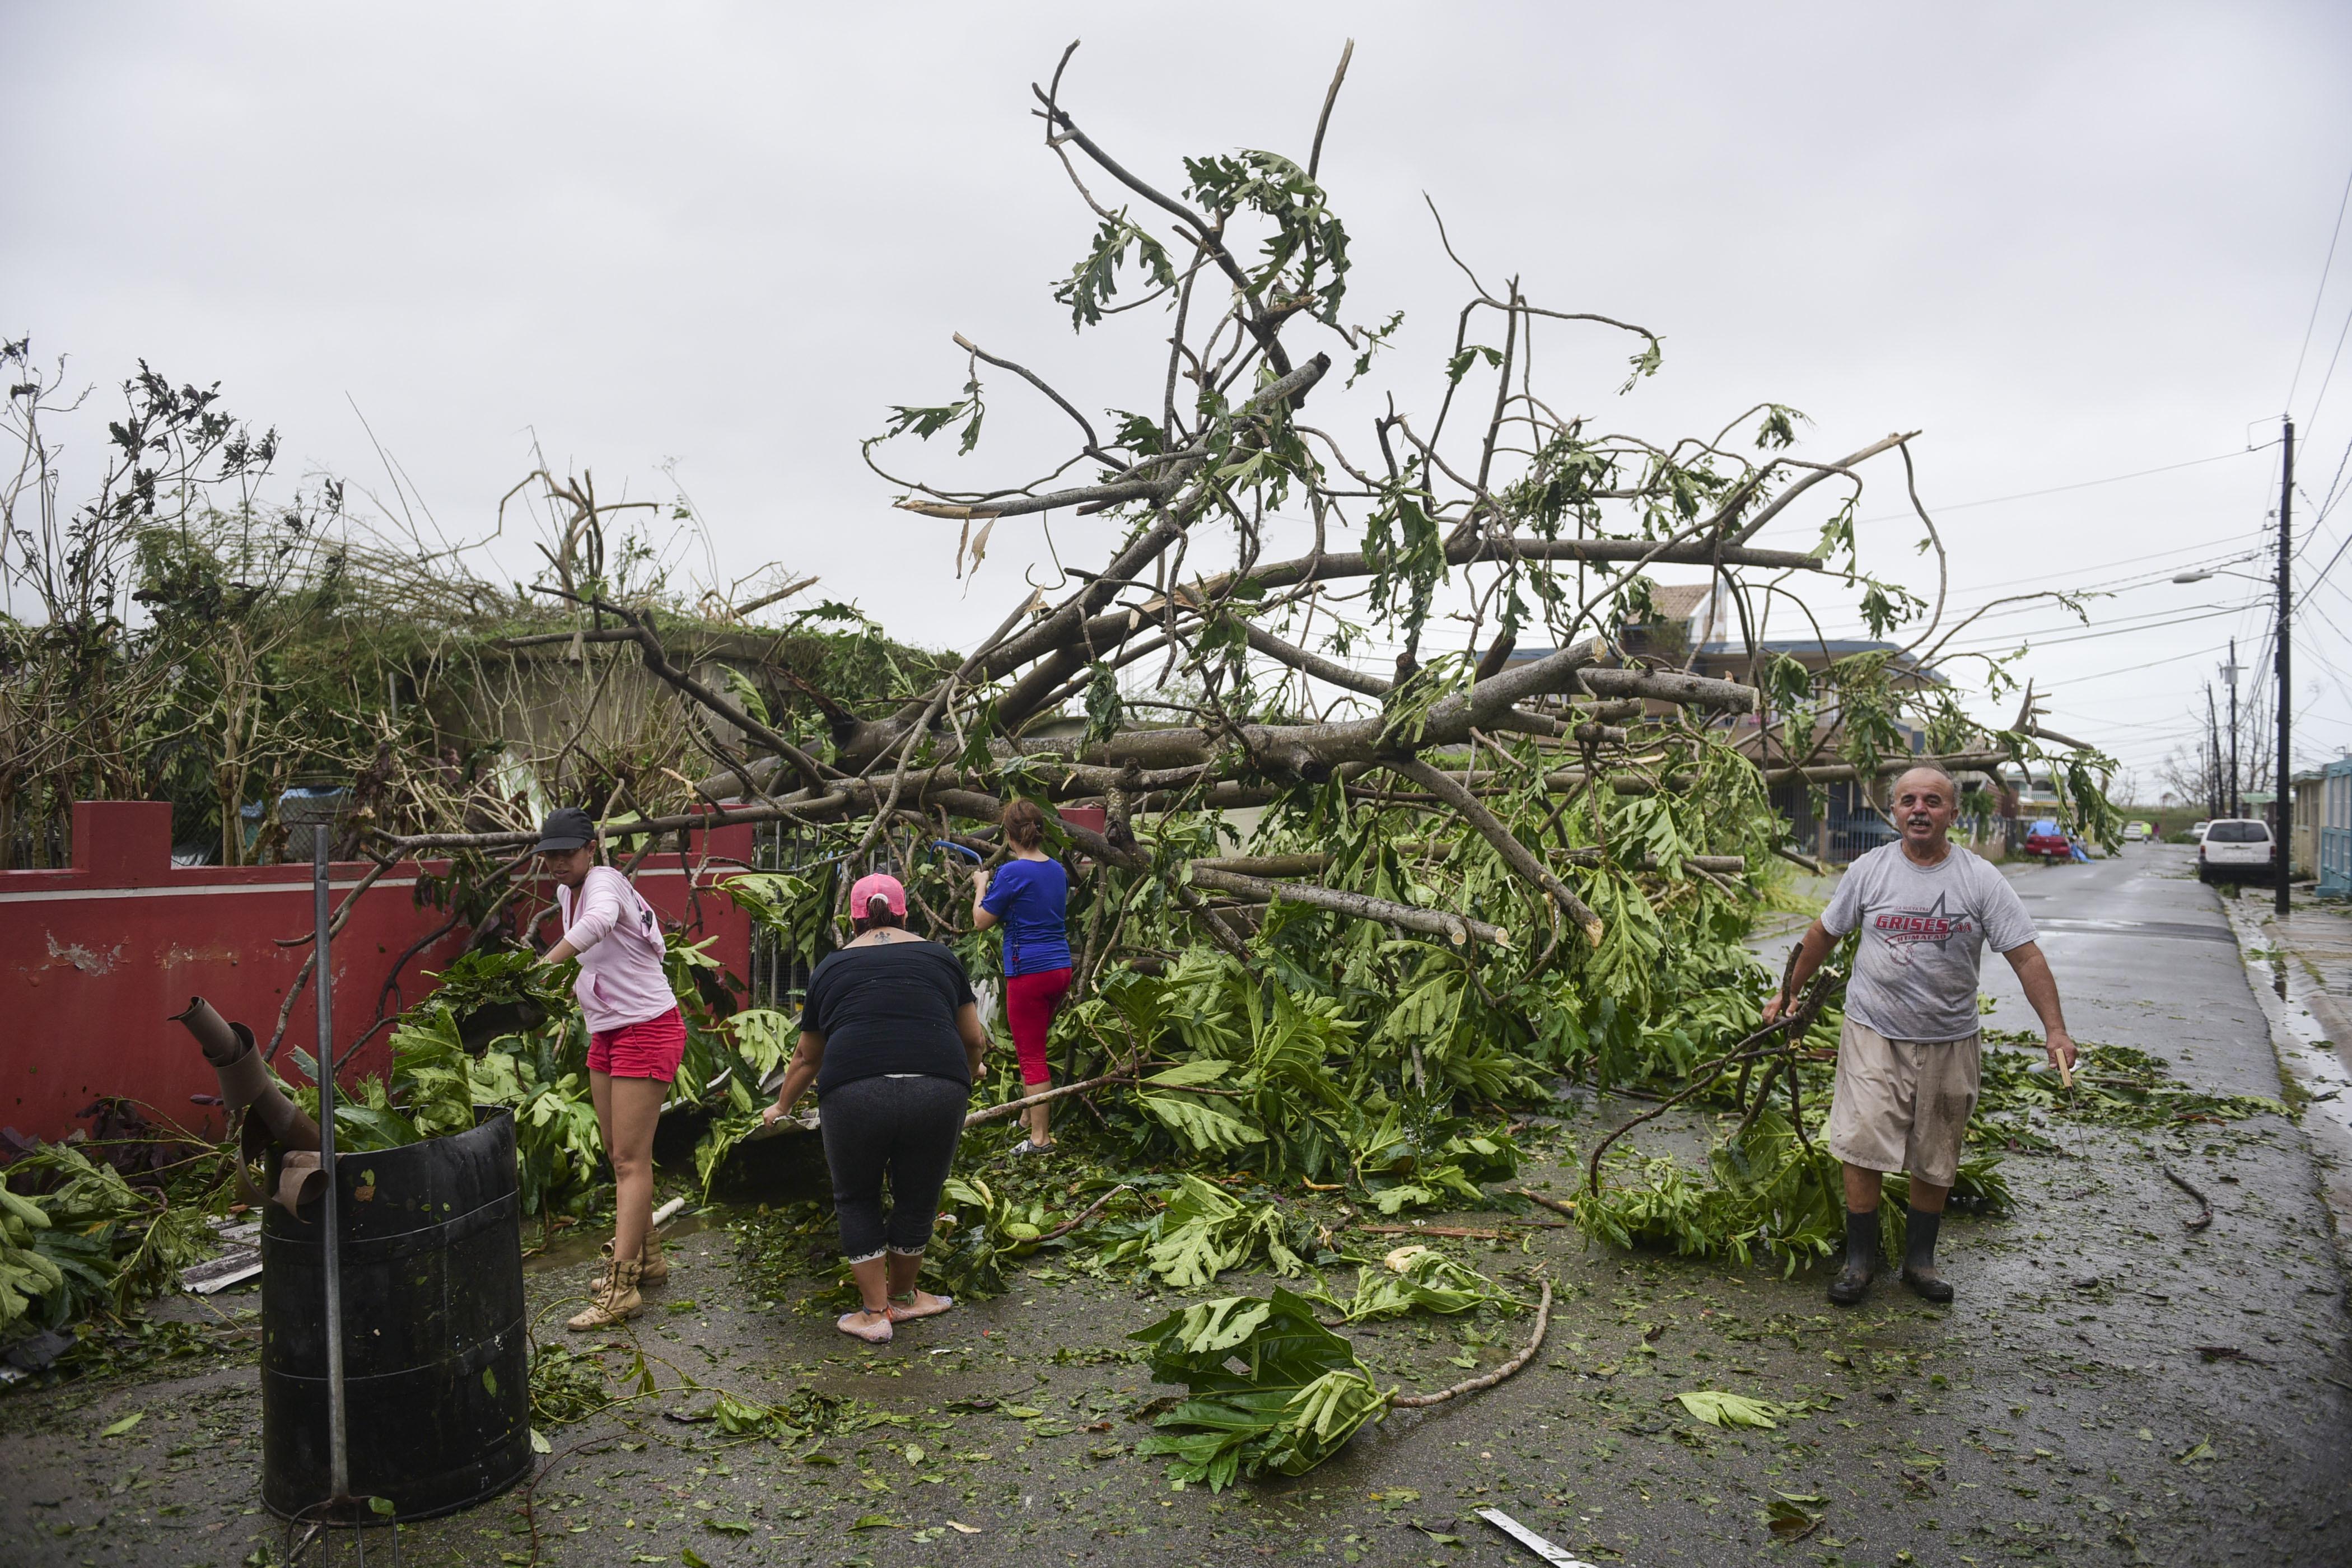 Scenes Of Hurricane Damage In Puerto Rico Wluk